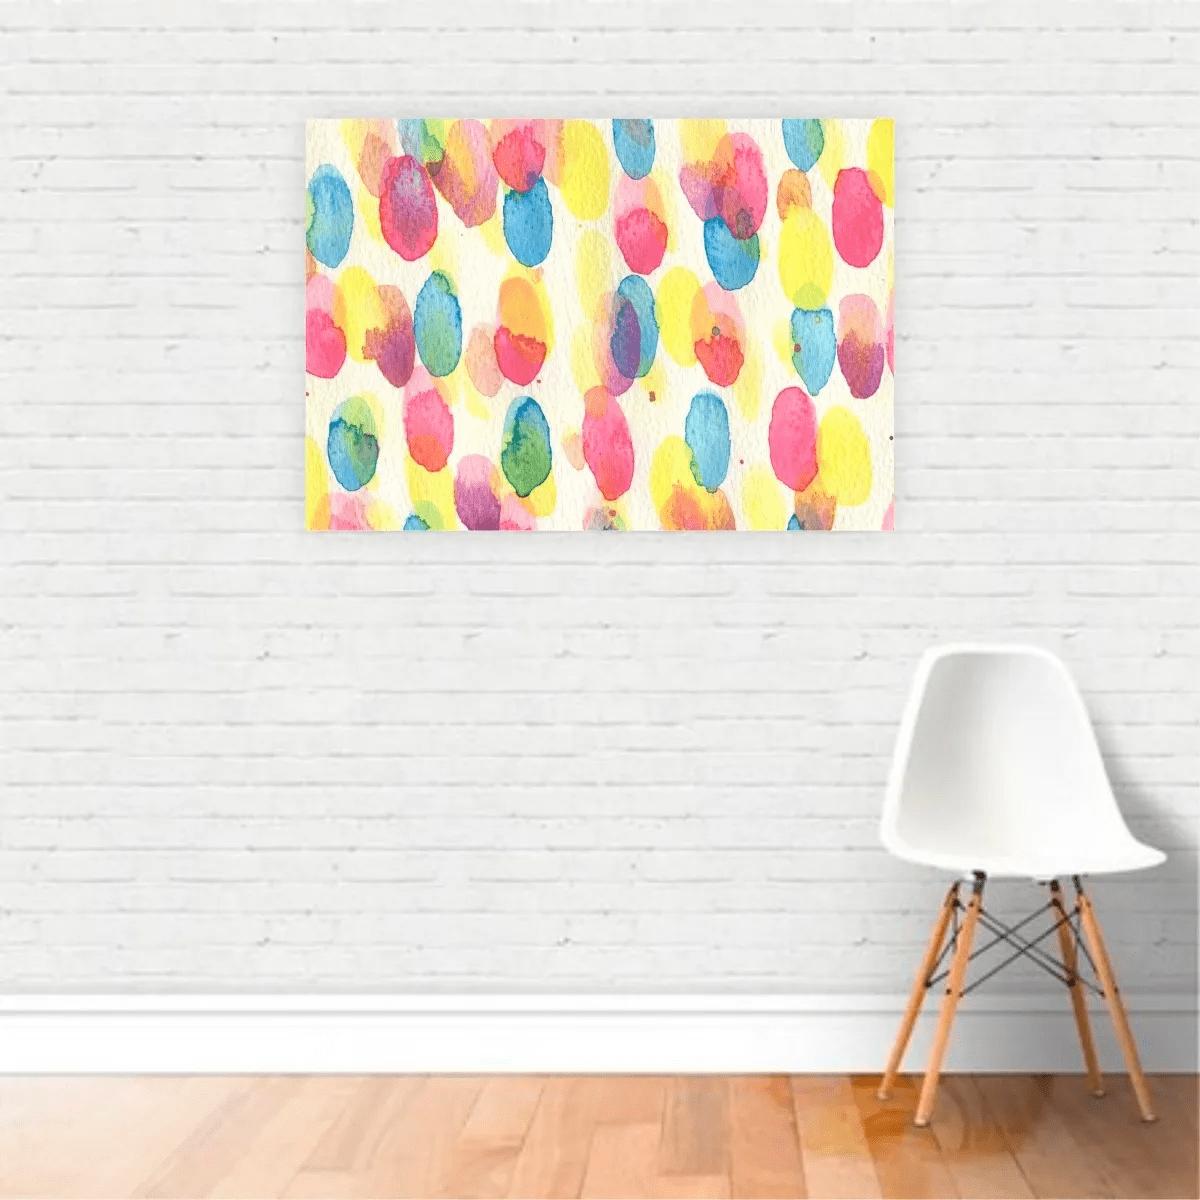 Quadro Canvas Premium Abstrato Tinta Colorida